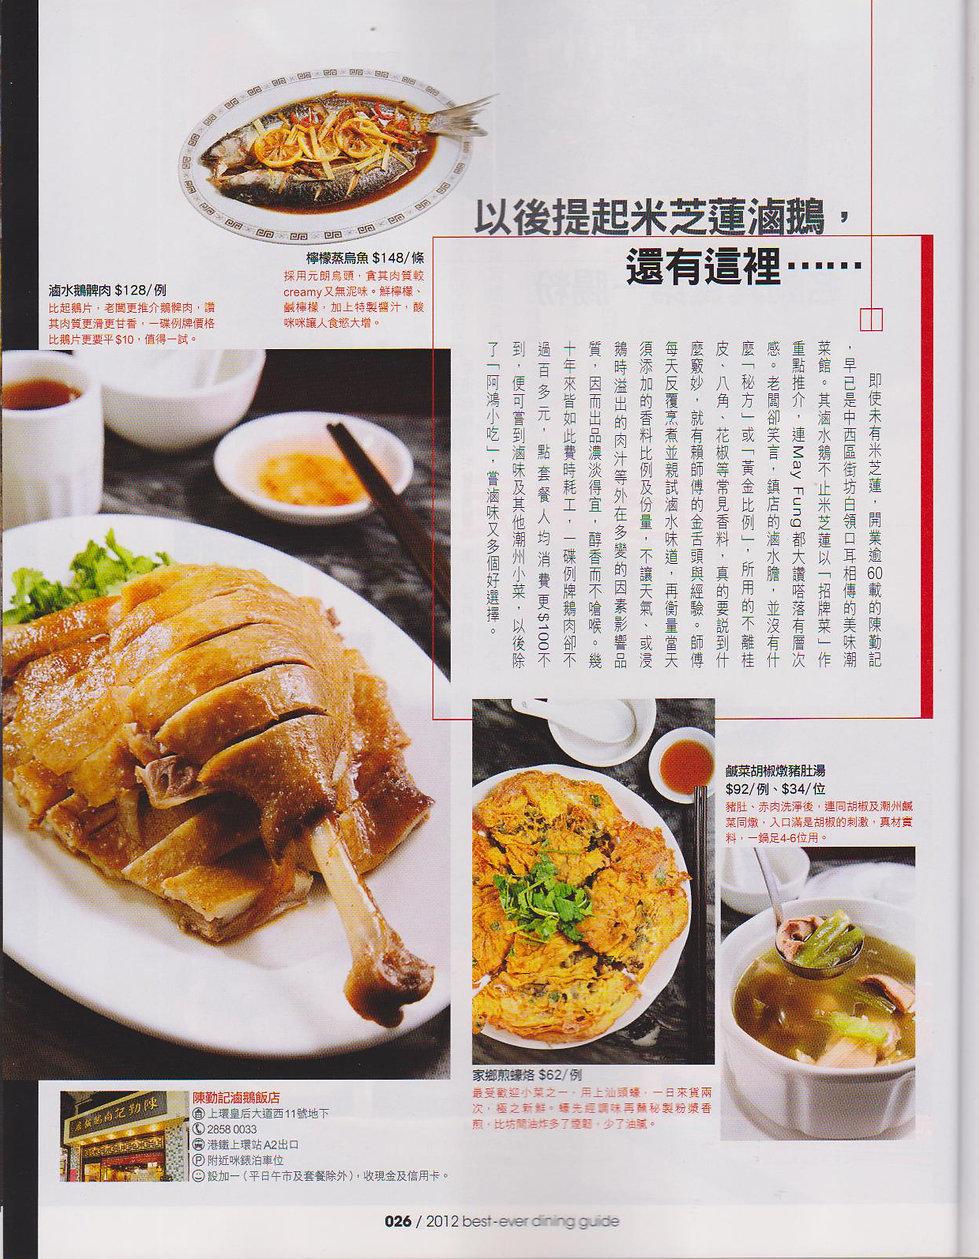 Chan Kan Kee - 新假期-2012全港必吃食店 第655期.jpg